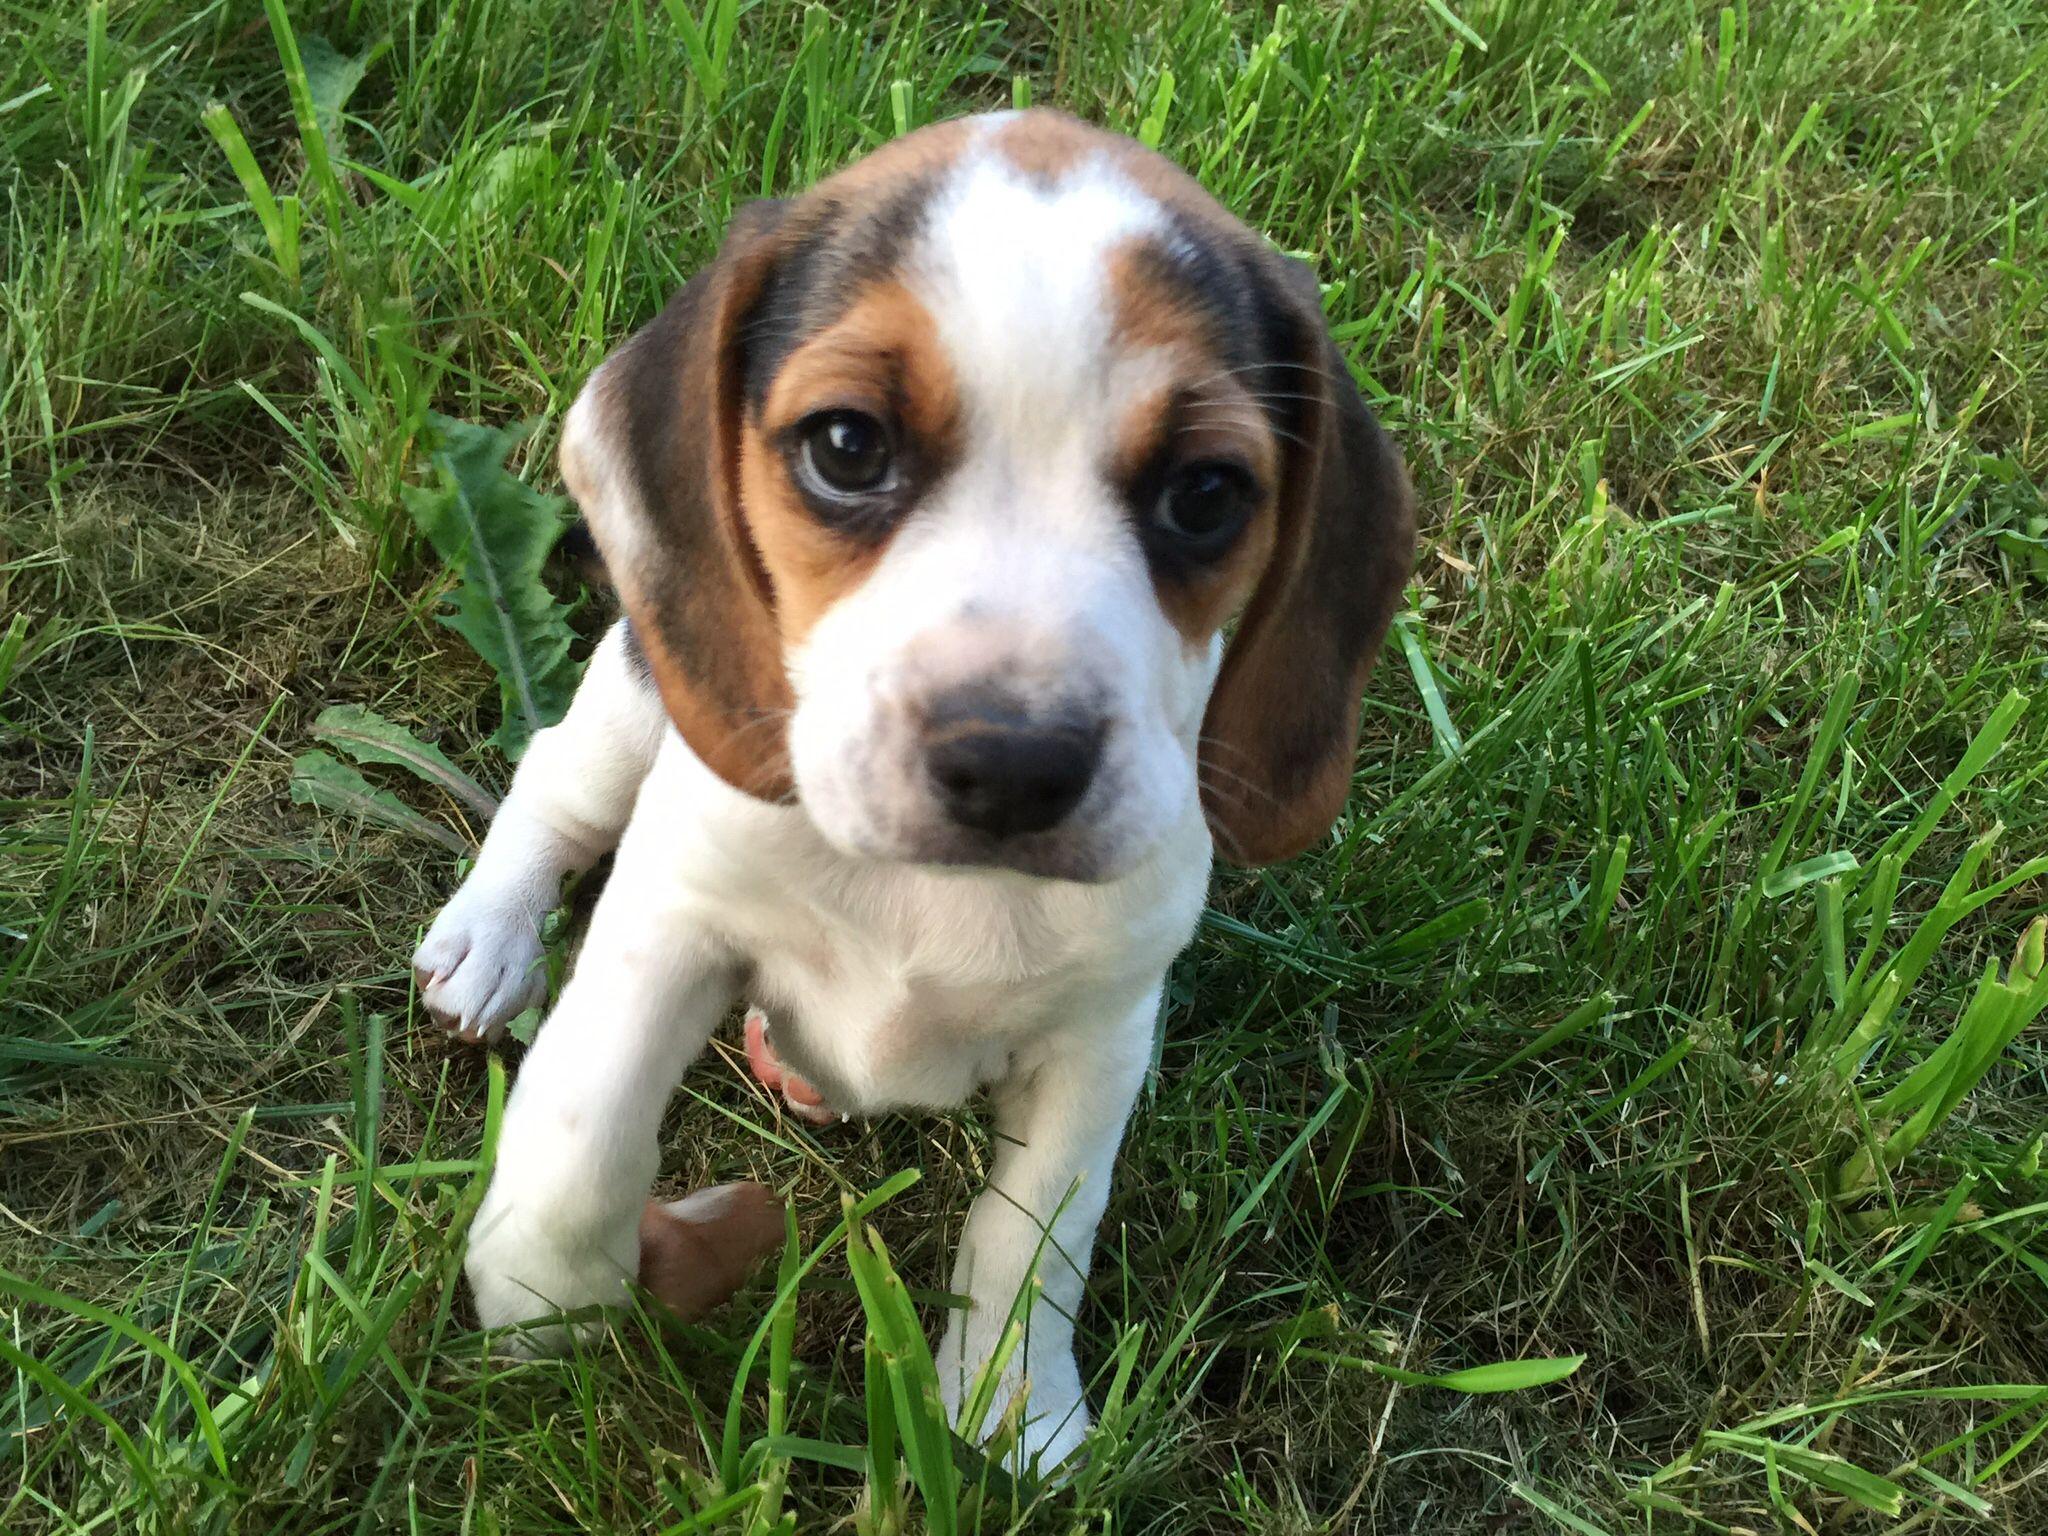 Www Pocketbeagleny Com Mini Beagle Puppy Pocket Beagles Beagle Puppy Mini Beagle Puppies